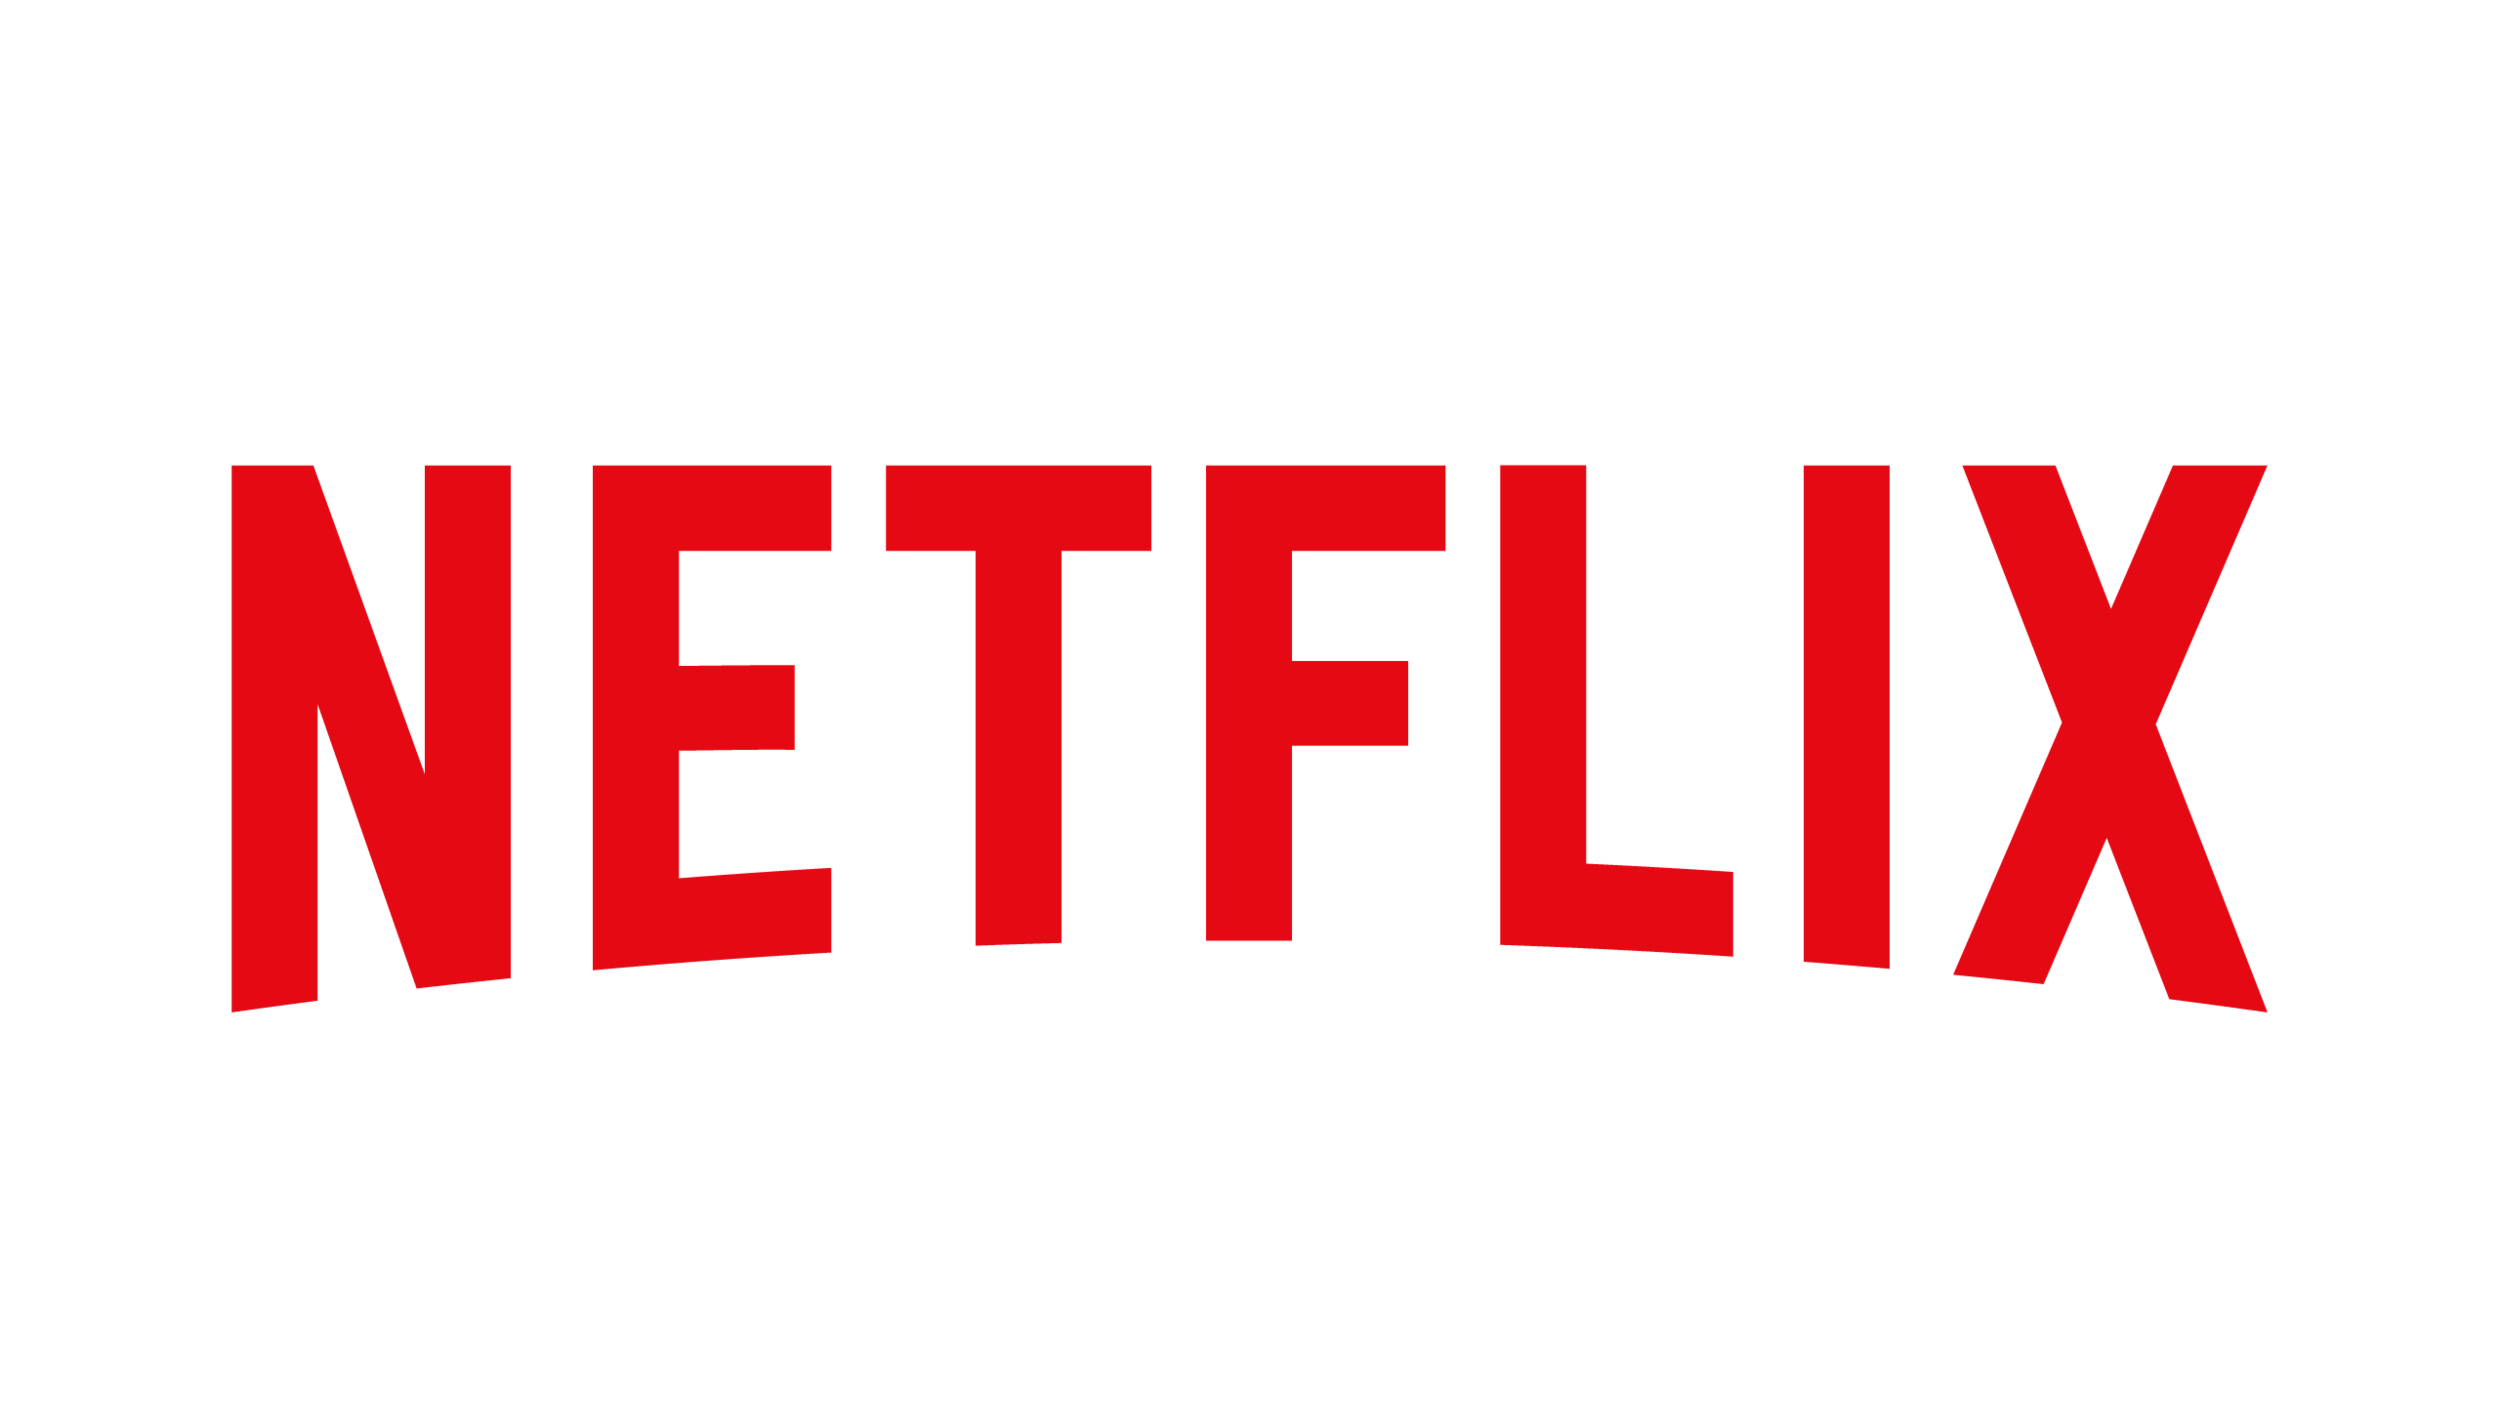 Netflix .png